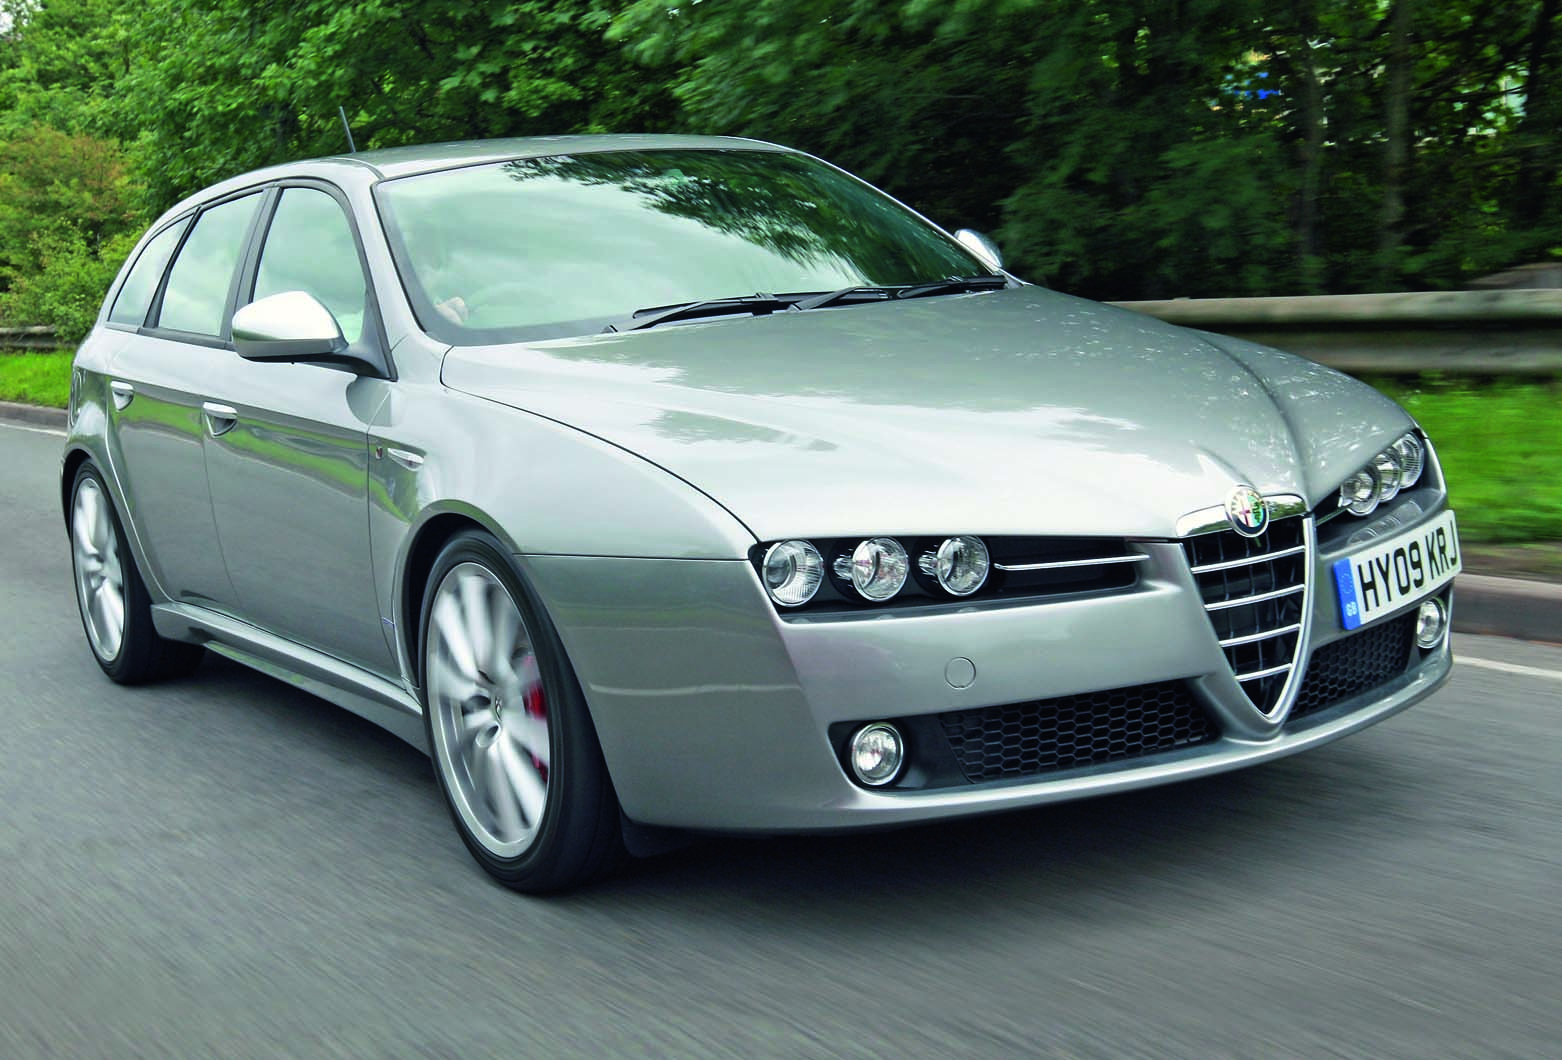 Used Car Buying Guide Alfa Romeo 159 Sportwagon Autocar